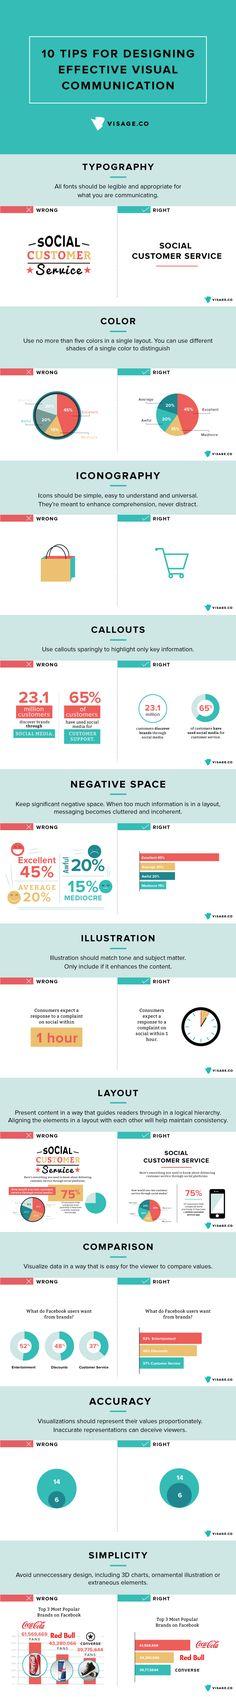 61 best Web Design images on Pinterest Advertising, Design - developer resume examples